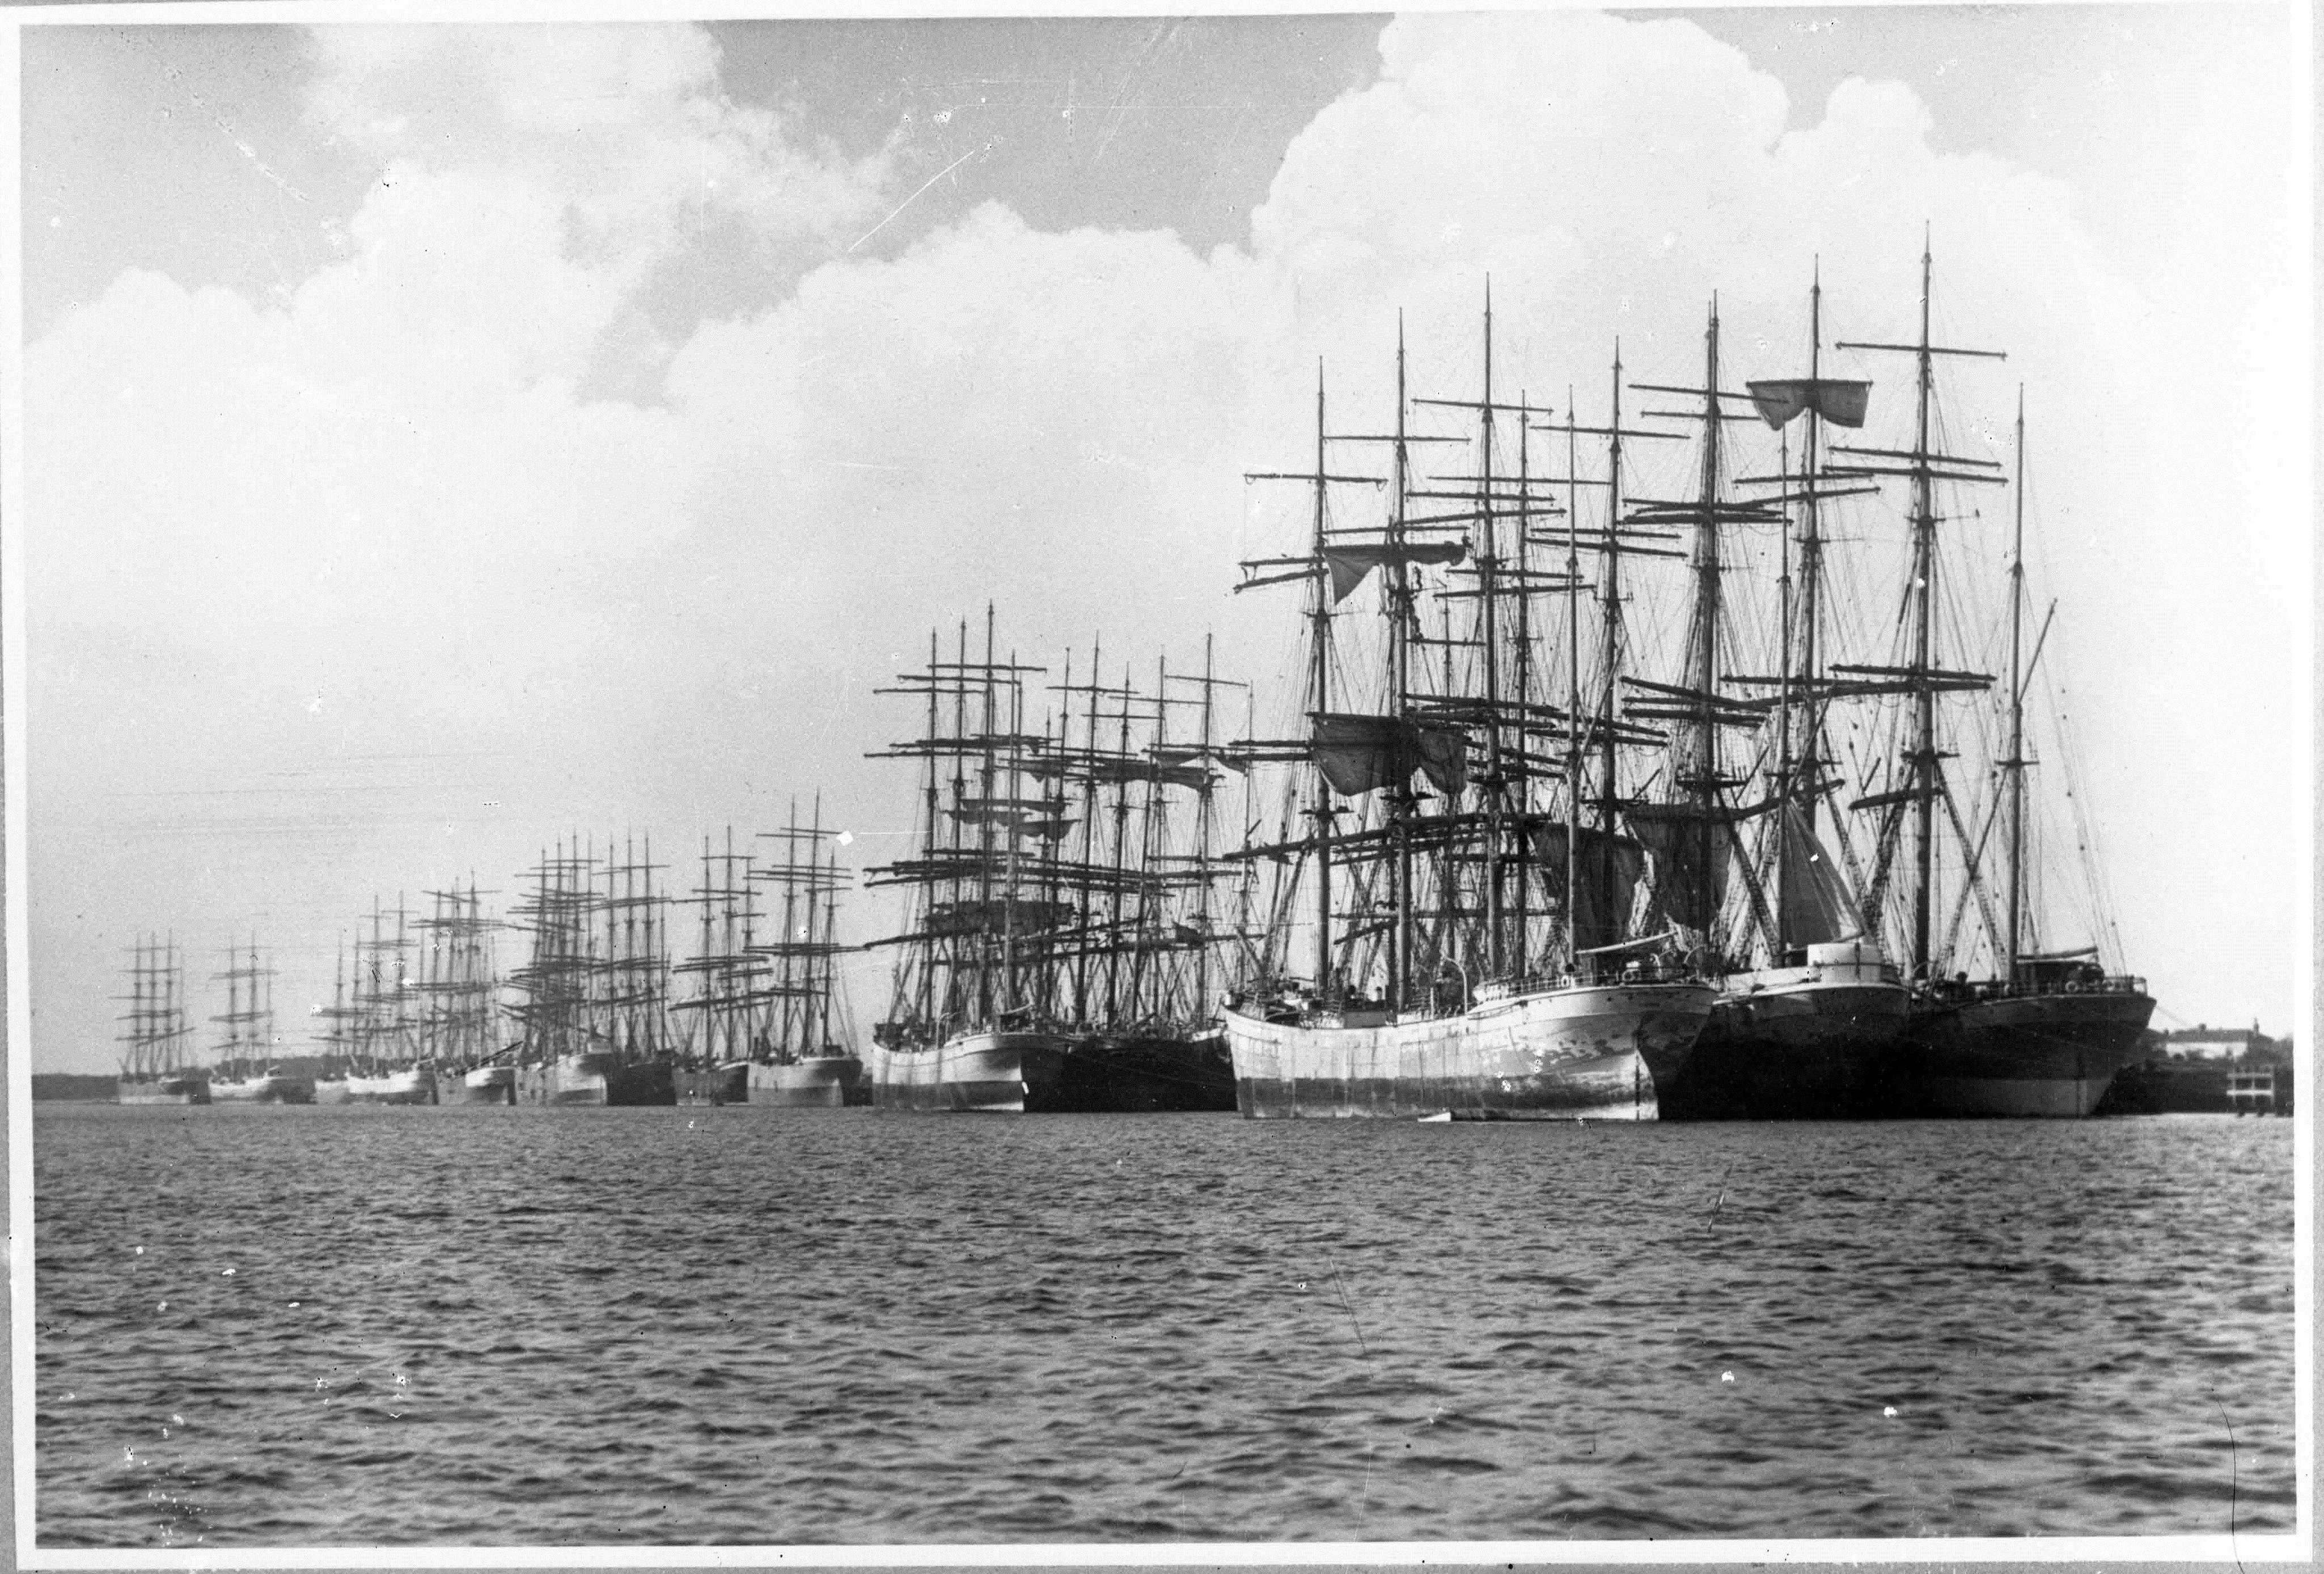 Wallpaper : sailing ship, sea, harbor, Newcastle, waterfront